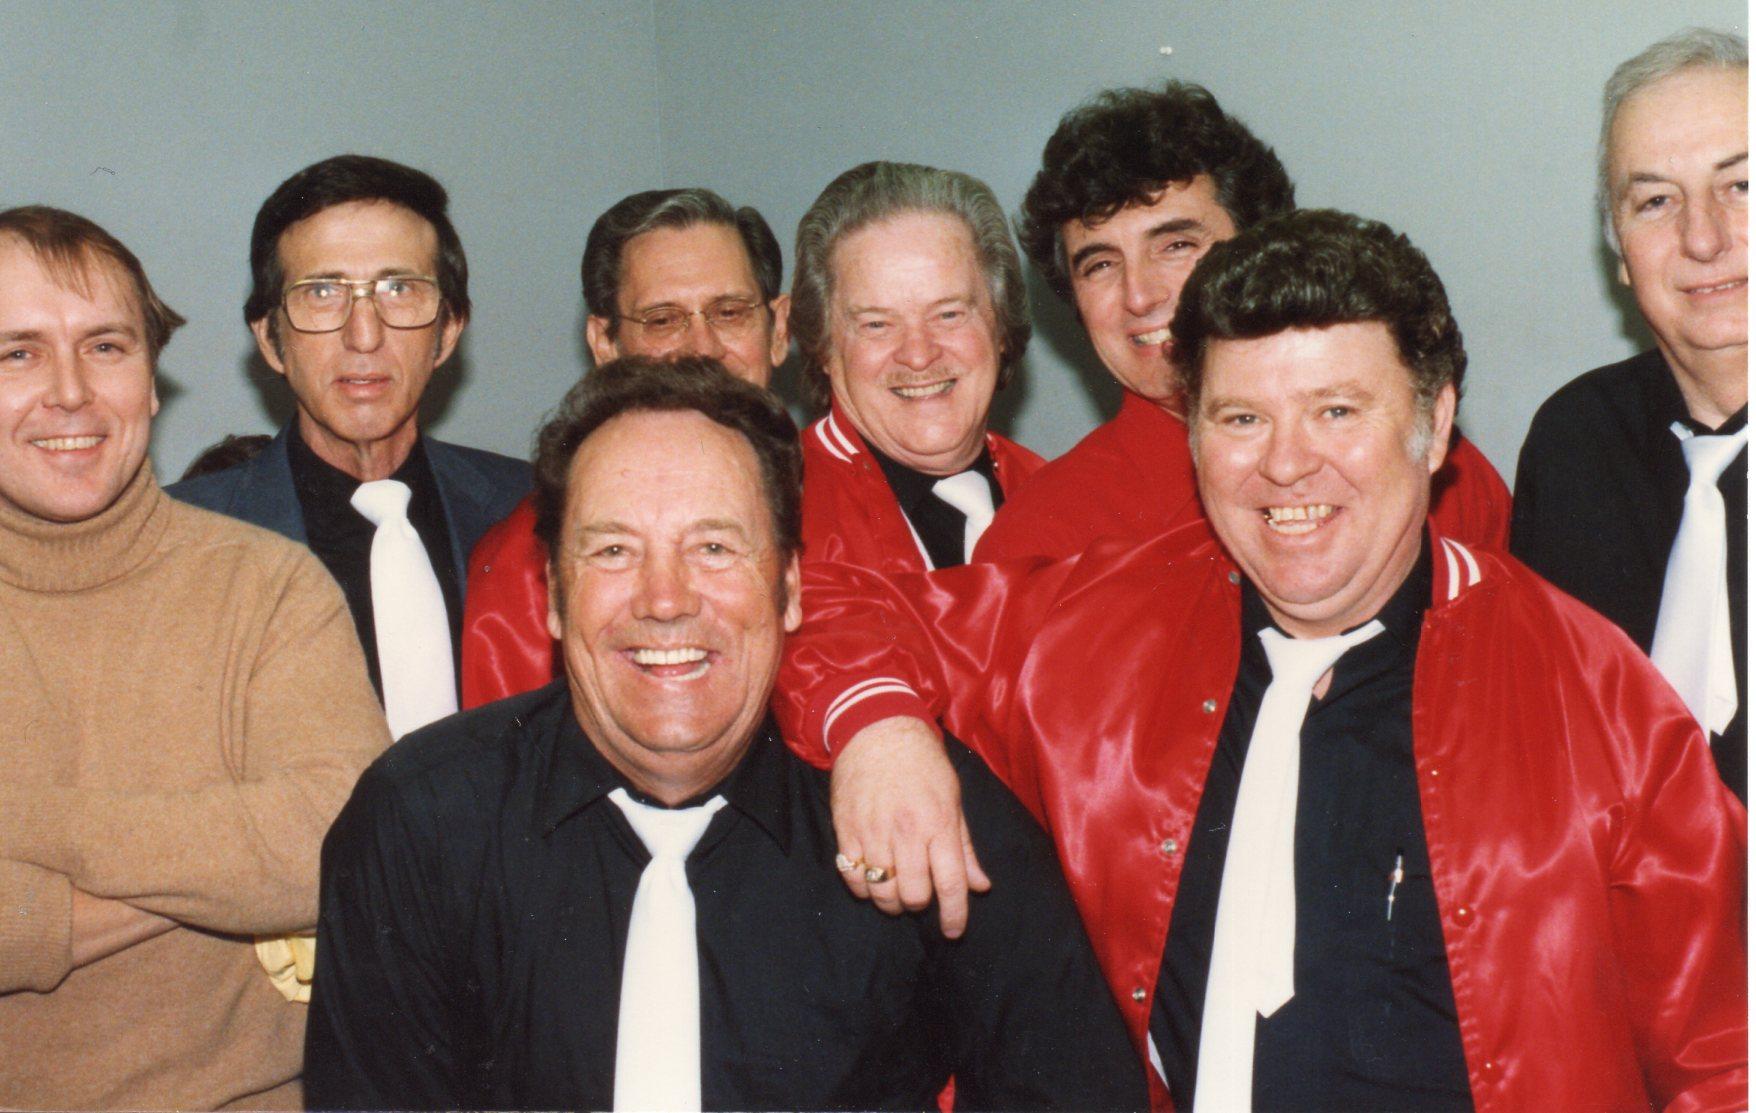 Paul Burlison, J.L. Smoothy Smith, D.J. Fontana,  Stan Kessler, Marcus Van Story & Sonny Burgess With John Tate & Vic Layne of Boston Rockabilly Music Conspiracy